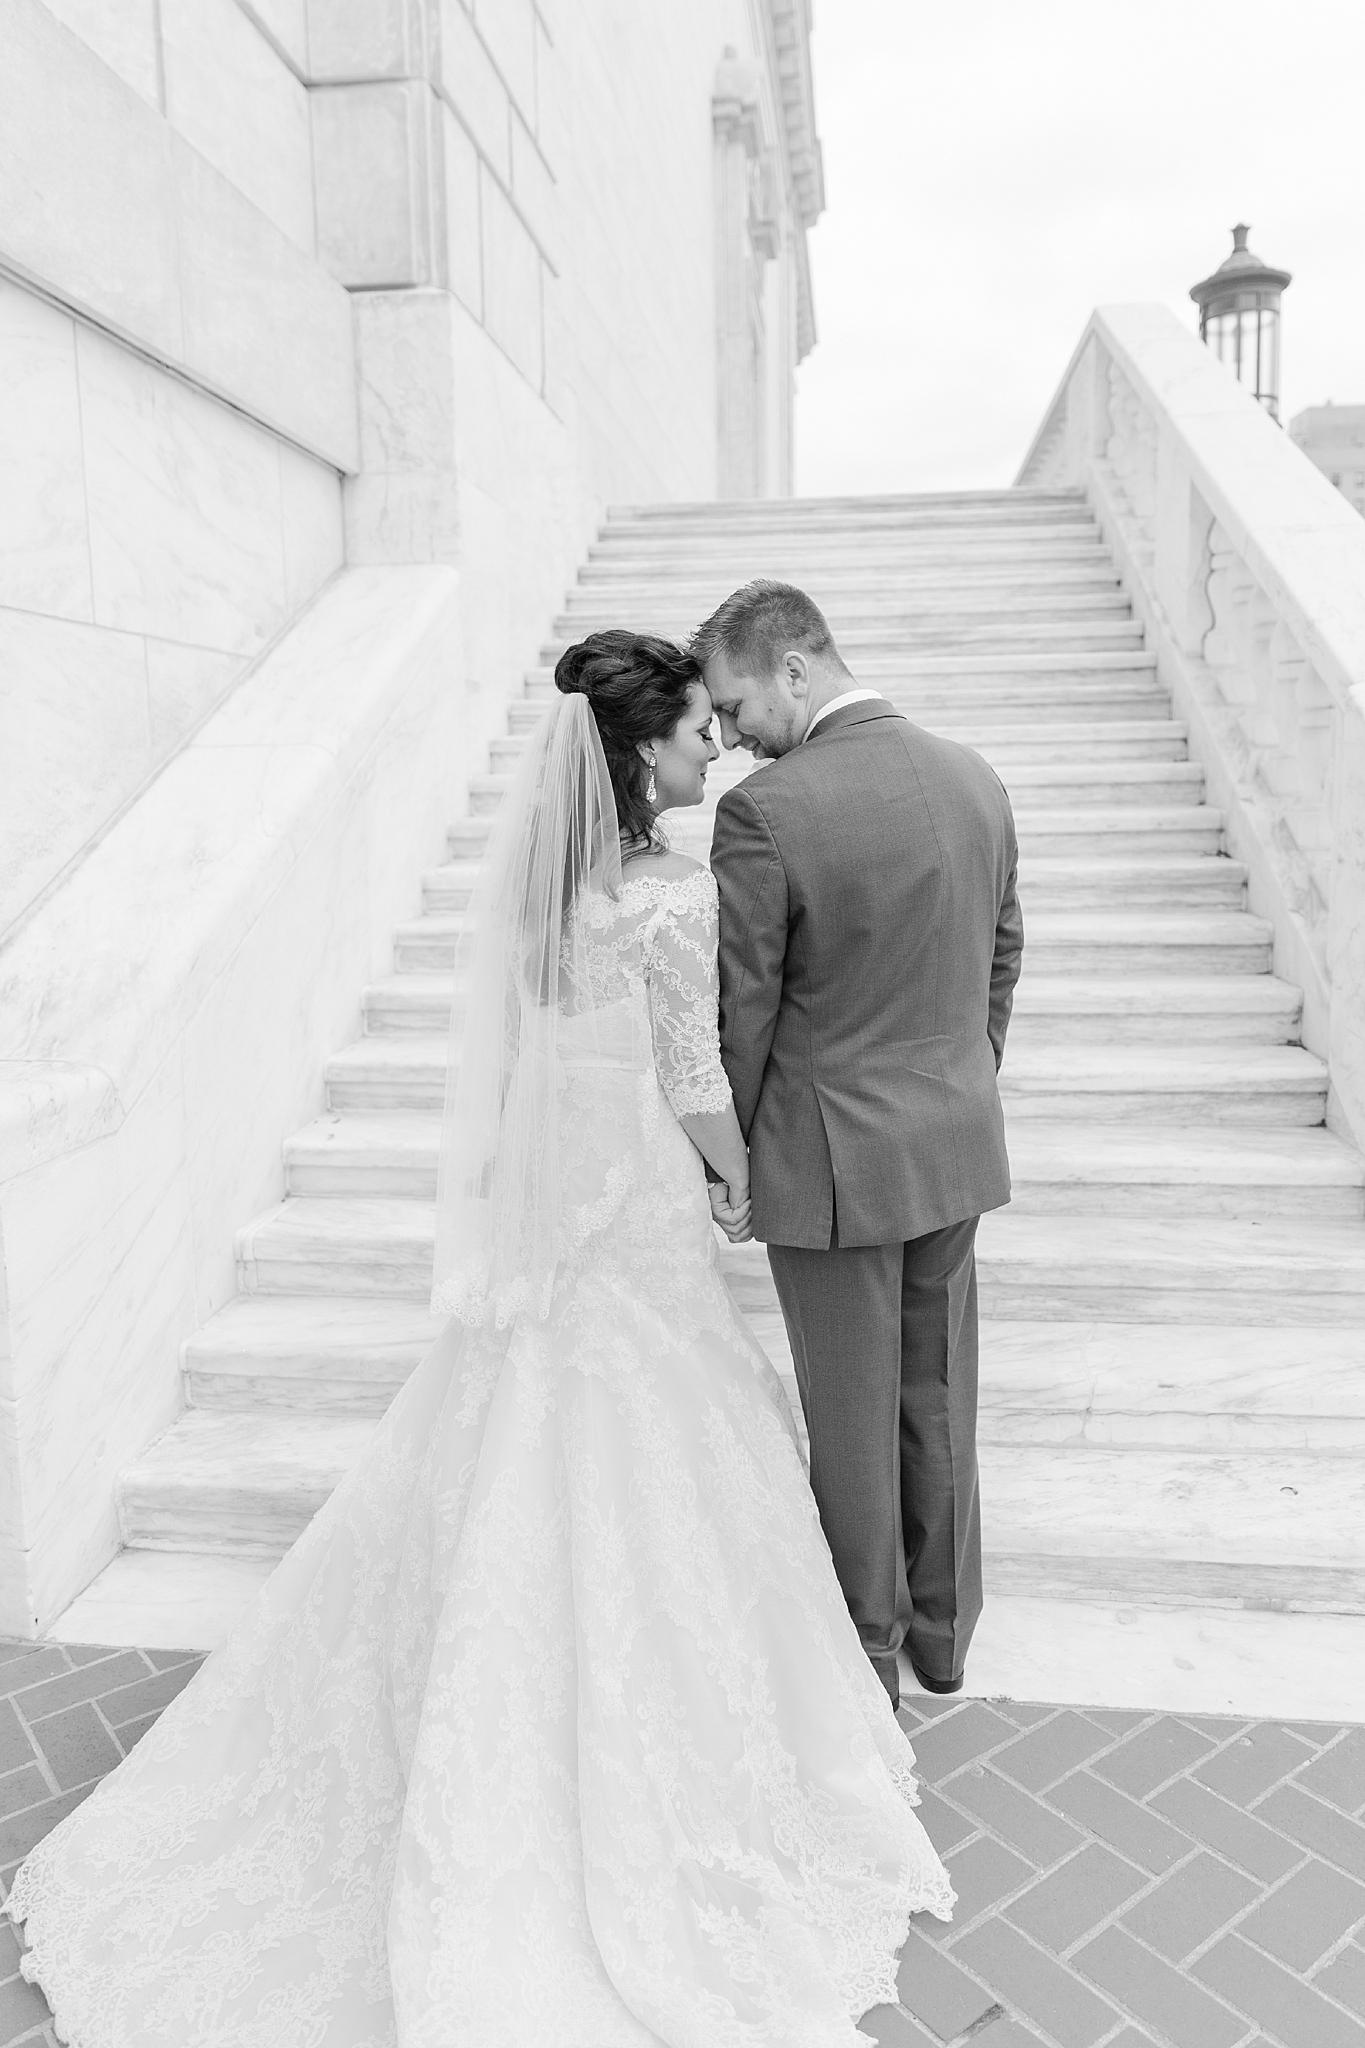 detroit-colony-club-wedding-regal-romantic-photography-in-detroit-mi-by-courtney-carolyn-photography_0035.jpg